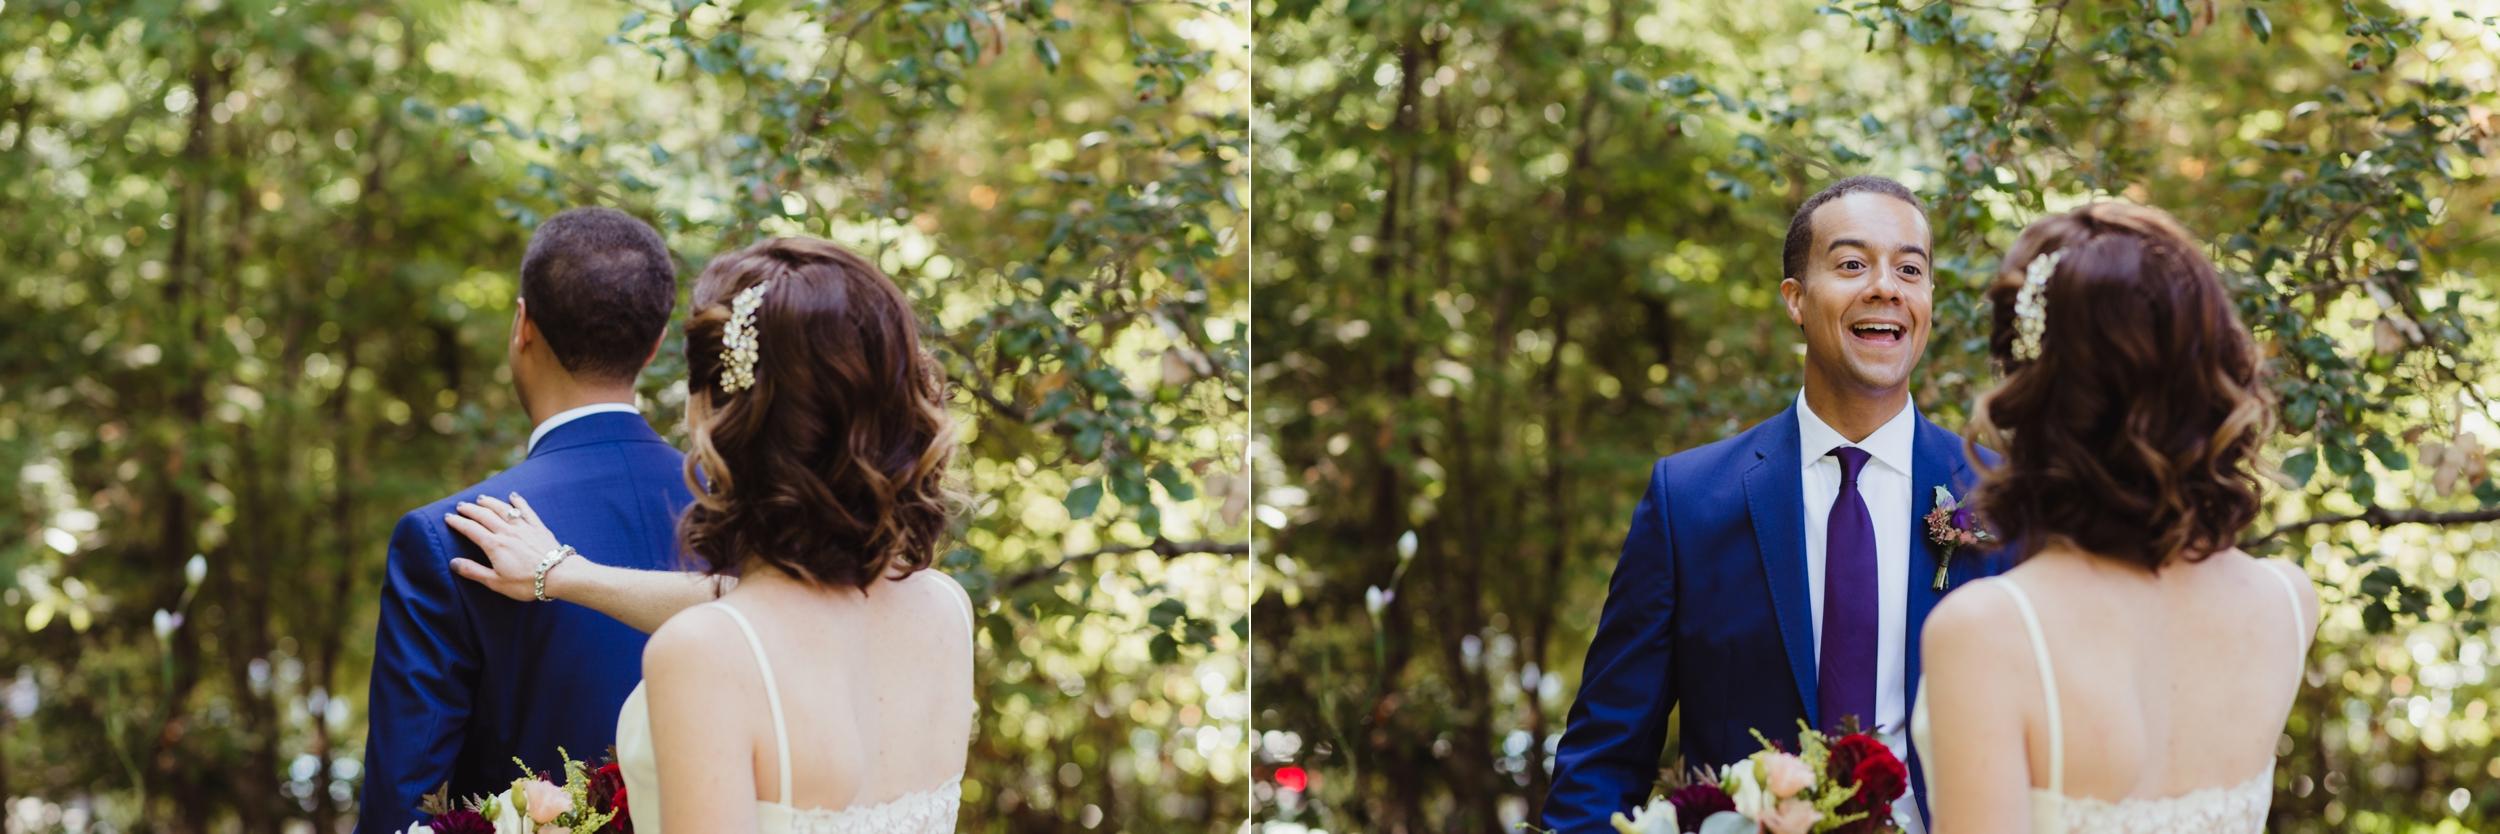 20-outdoor-art-club-wedding-vivianchen-120_WEB.jpg